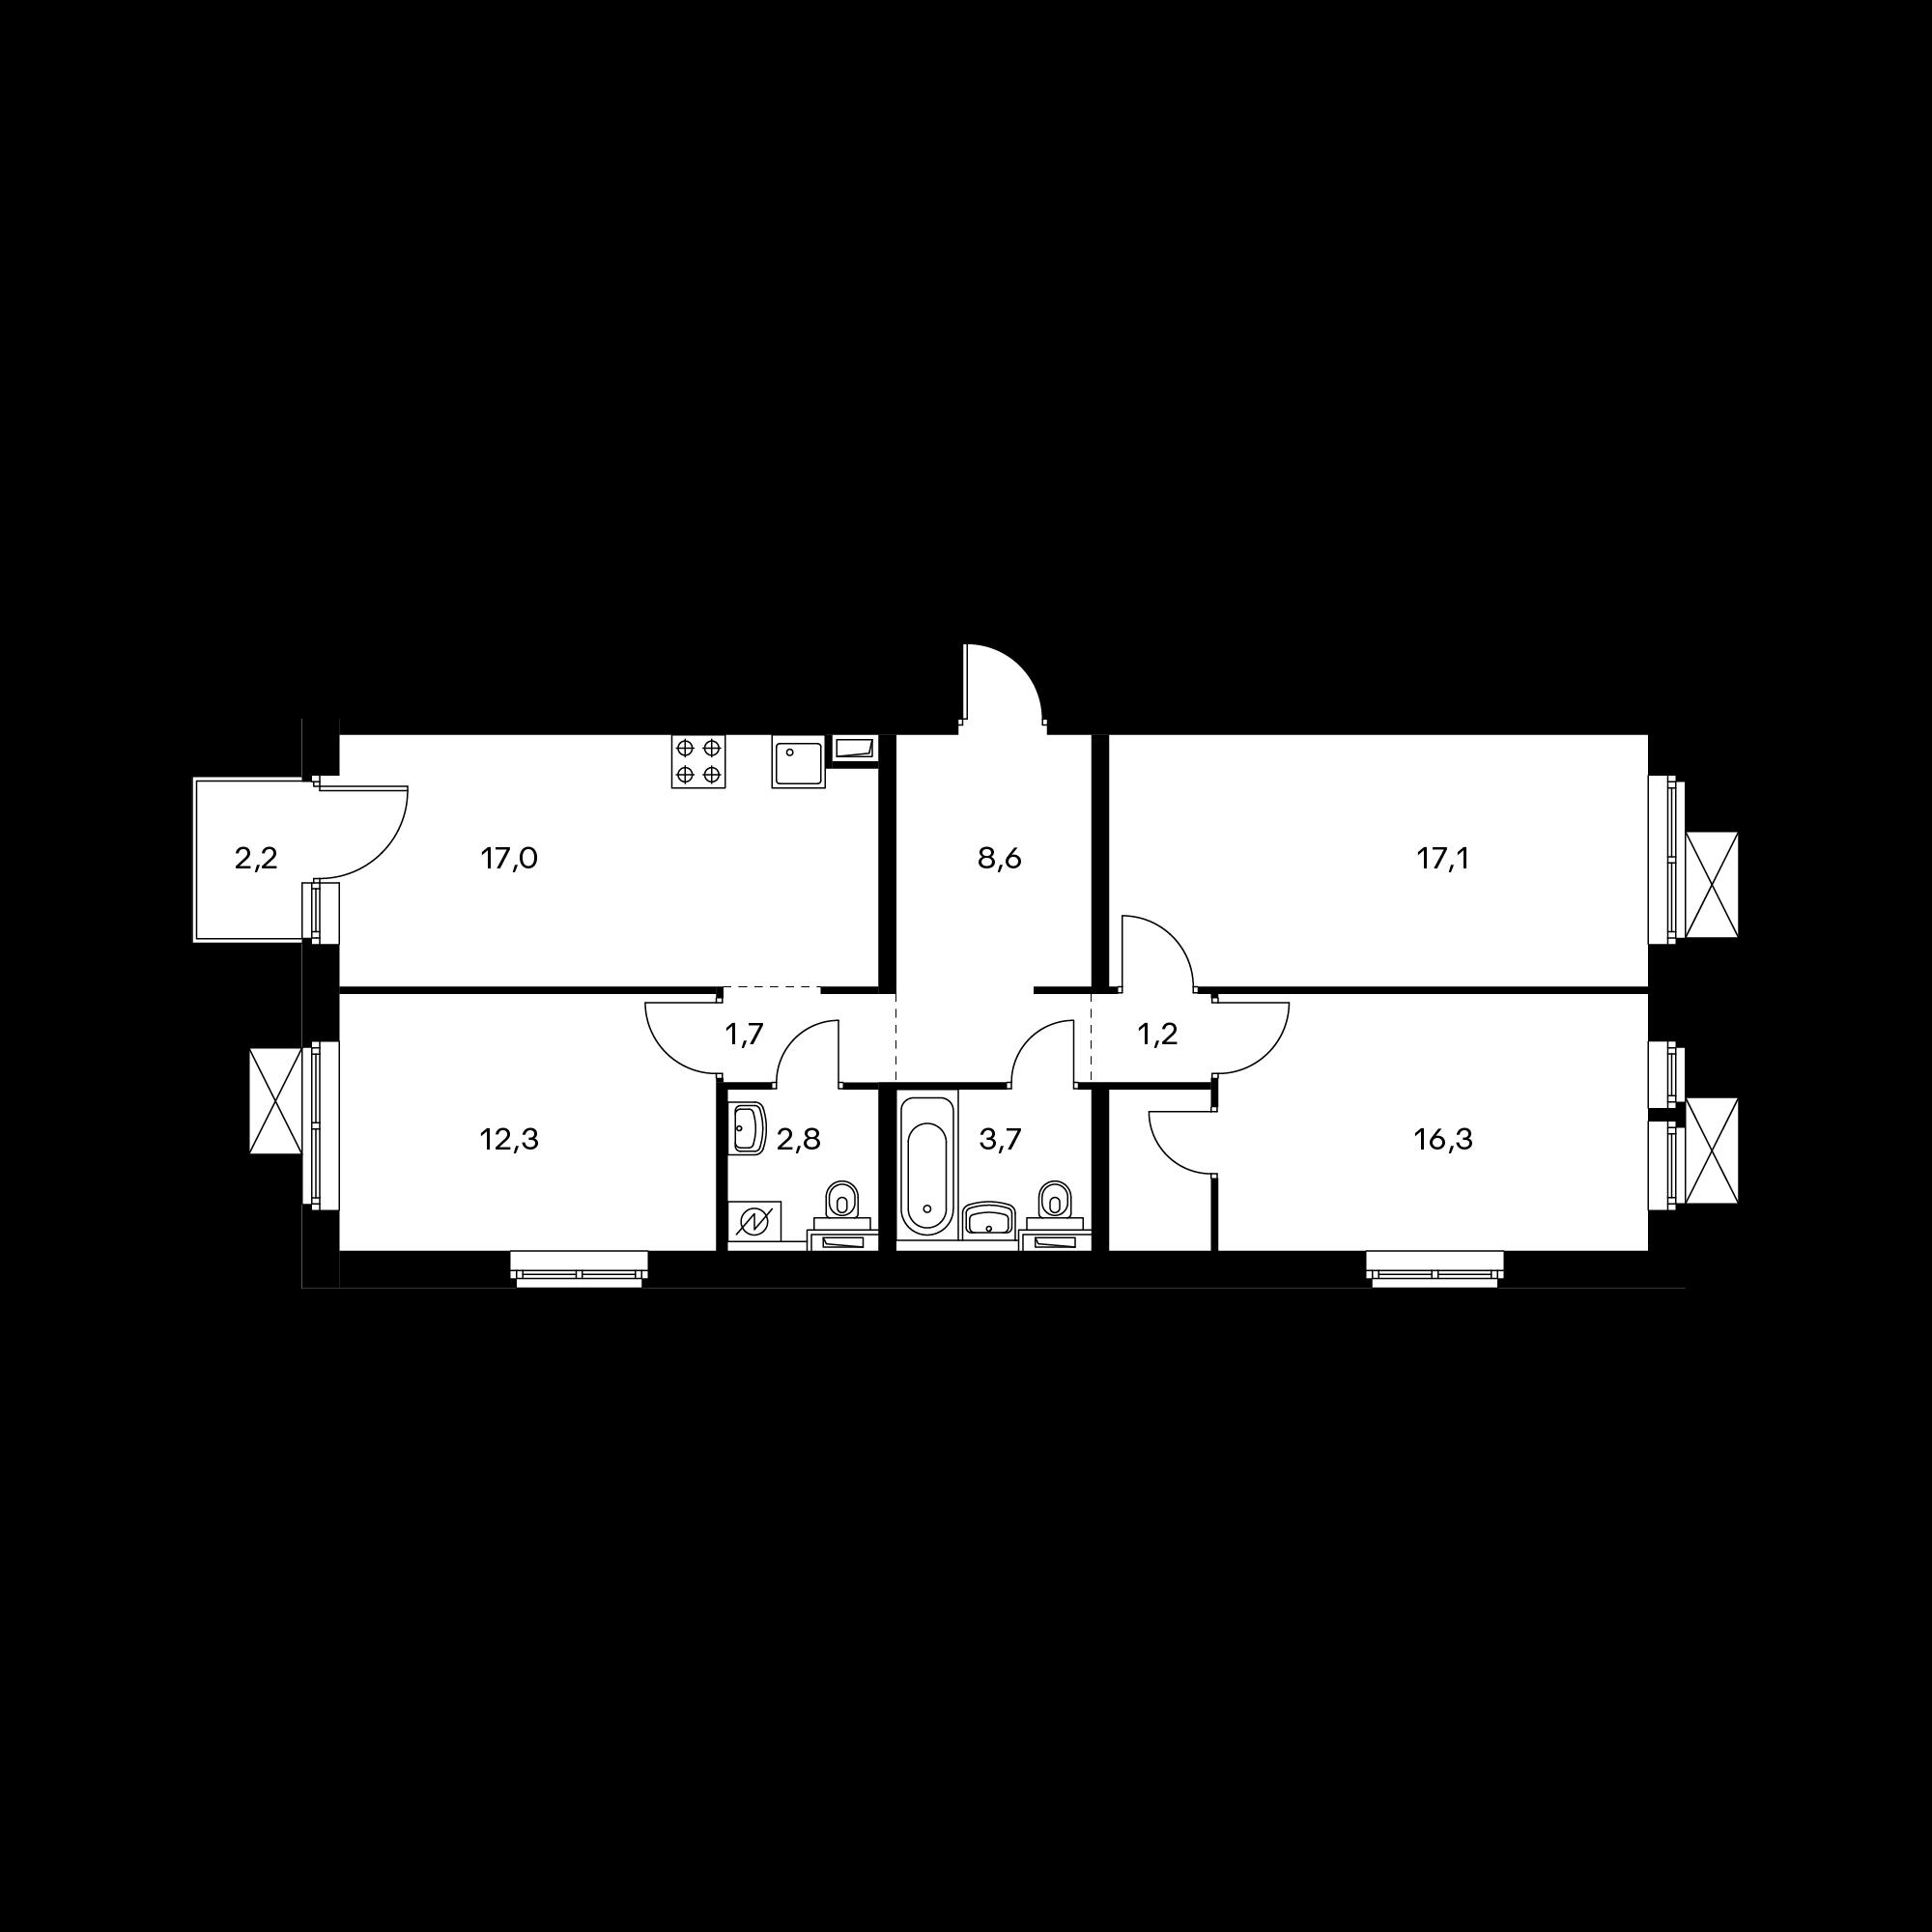 3KM16_6.0-1_B(2,2)_1